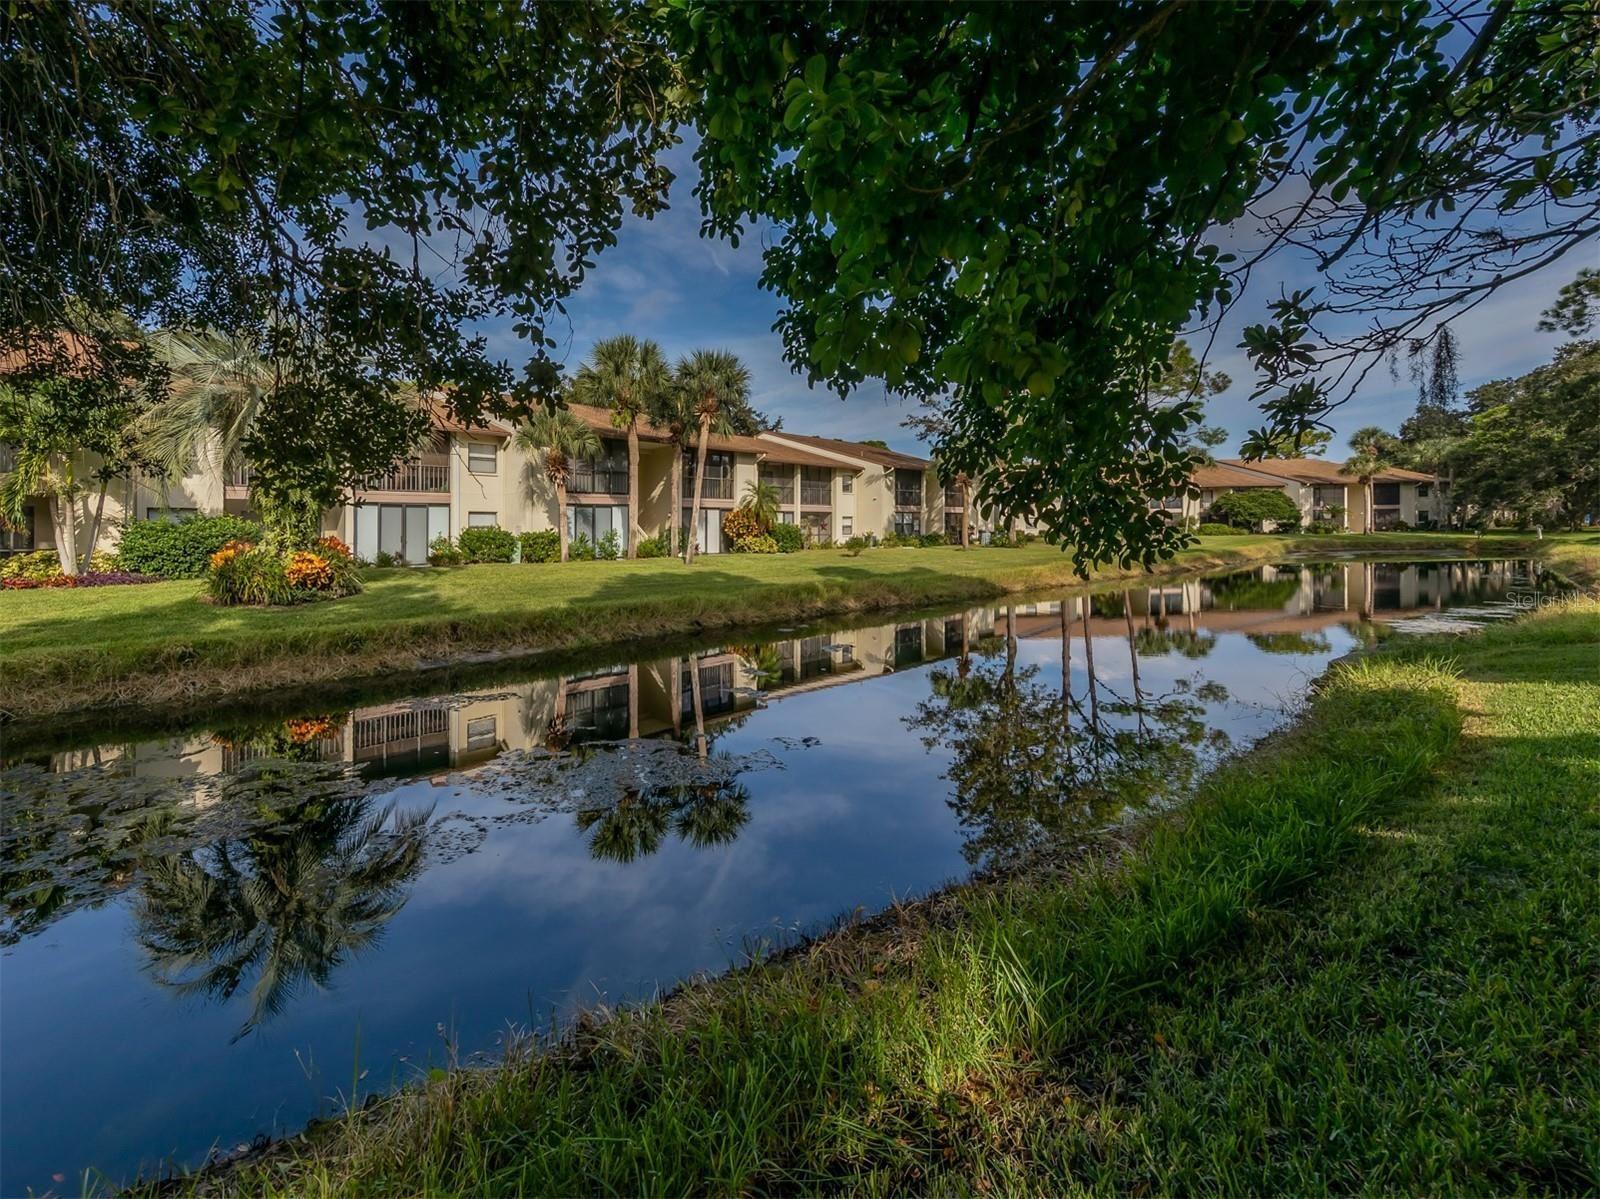 Photo of 756 WHITE PINE TREE ROAD #206, VENICE, FL 34285 (MLS # N6118031)